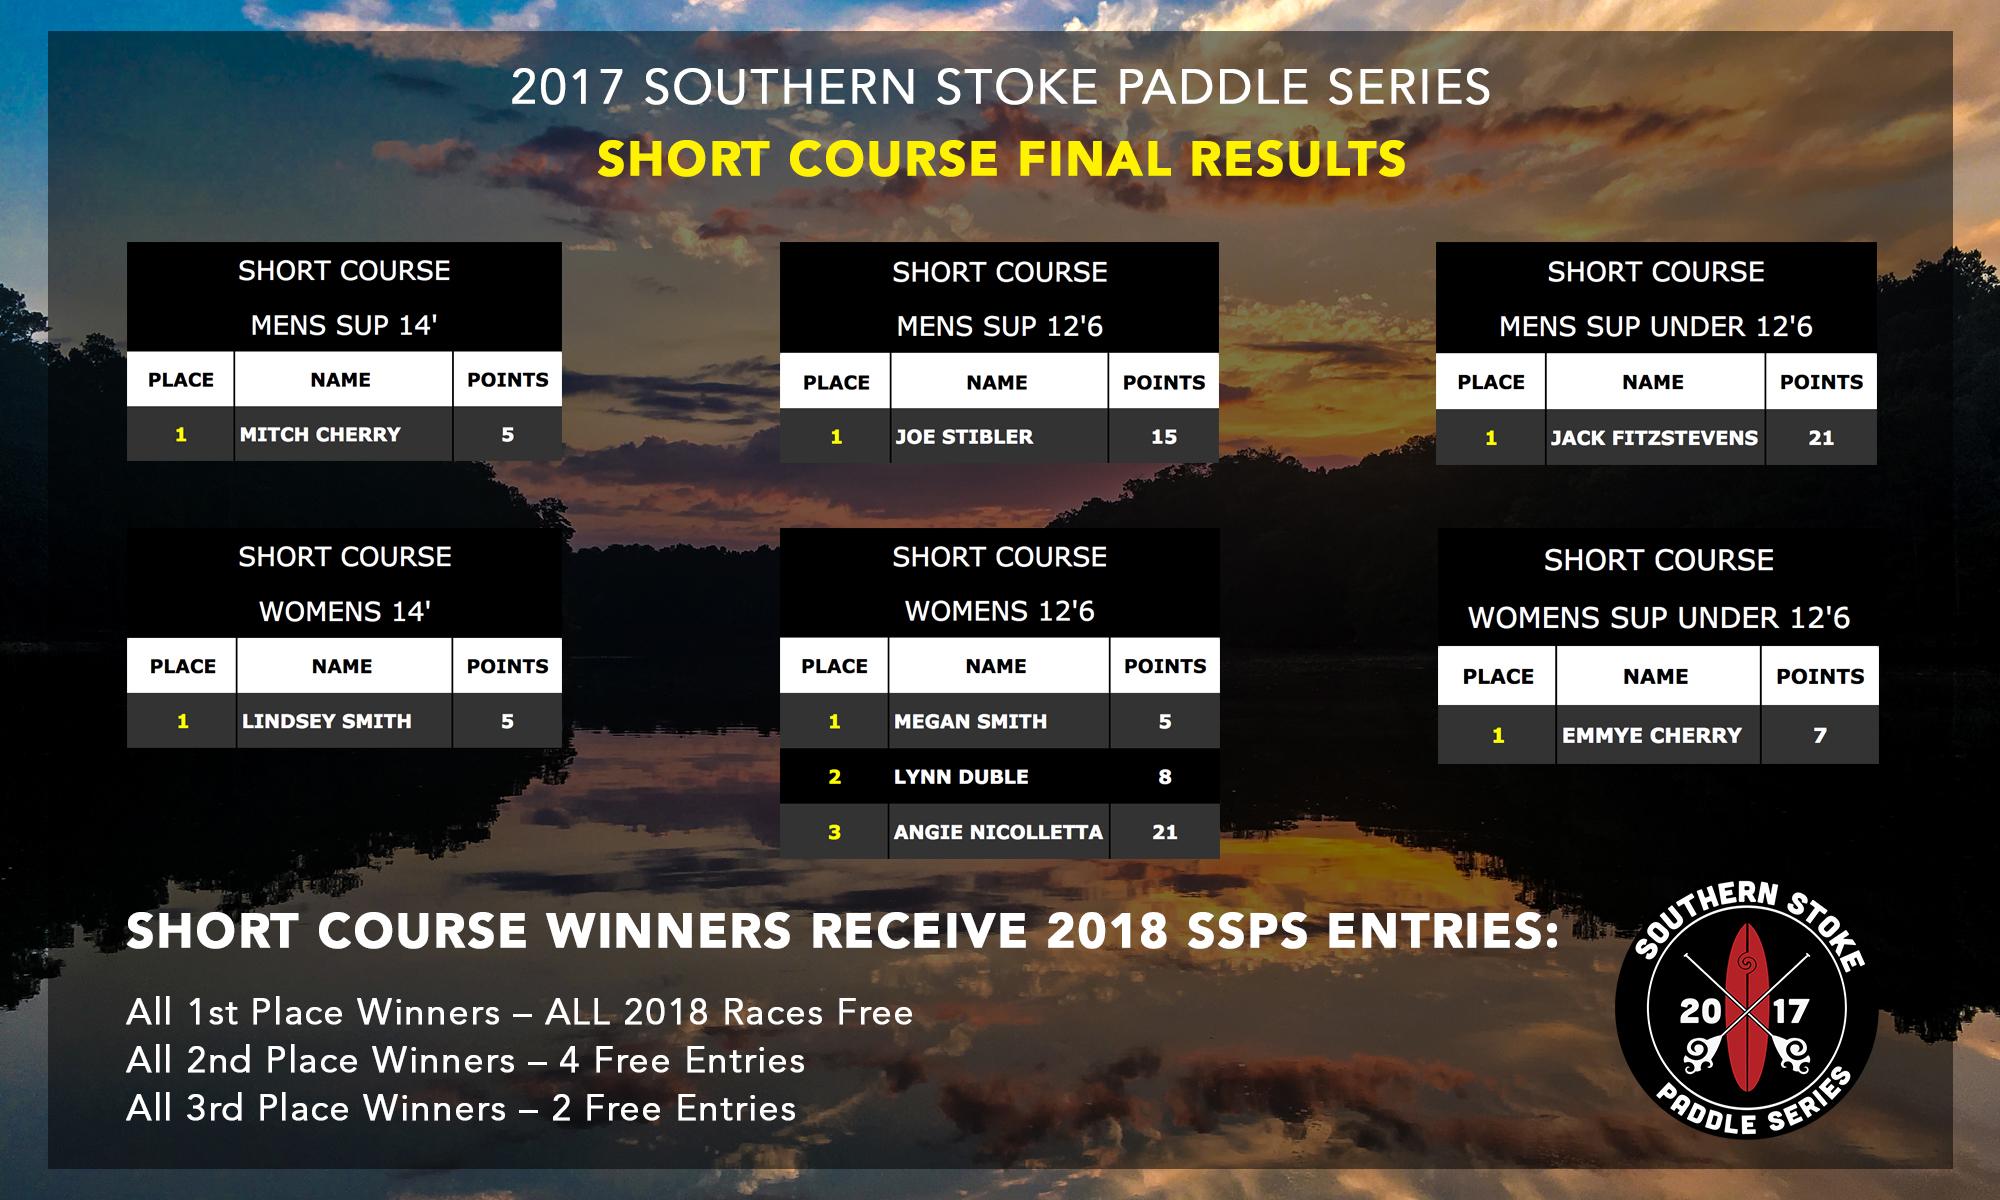 2017 Southern Stoke Race Series Short Course Winners